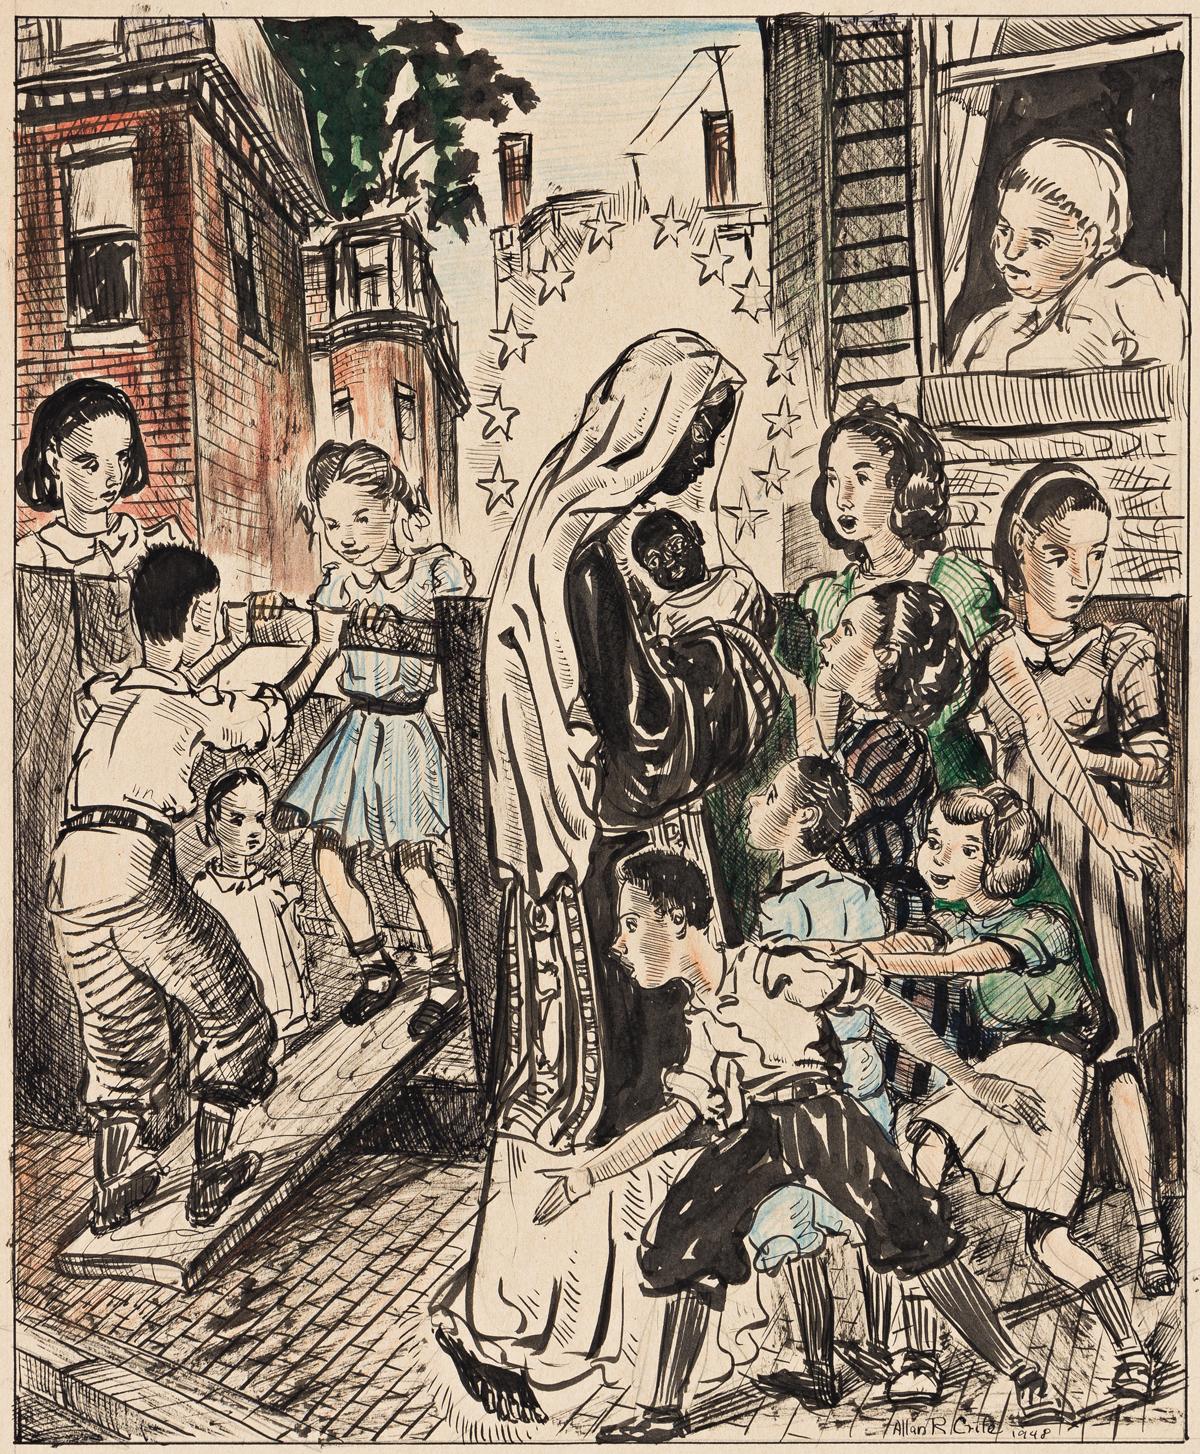 ALLAN ROHAN CRITE (1910 - 2007) Our Lady of the Neighborhood.